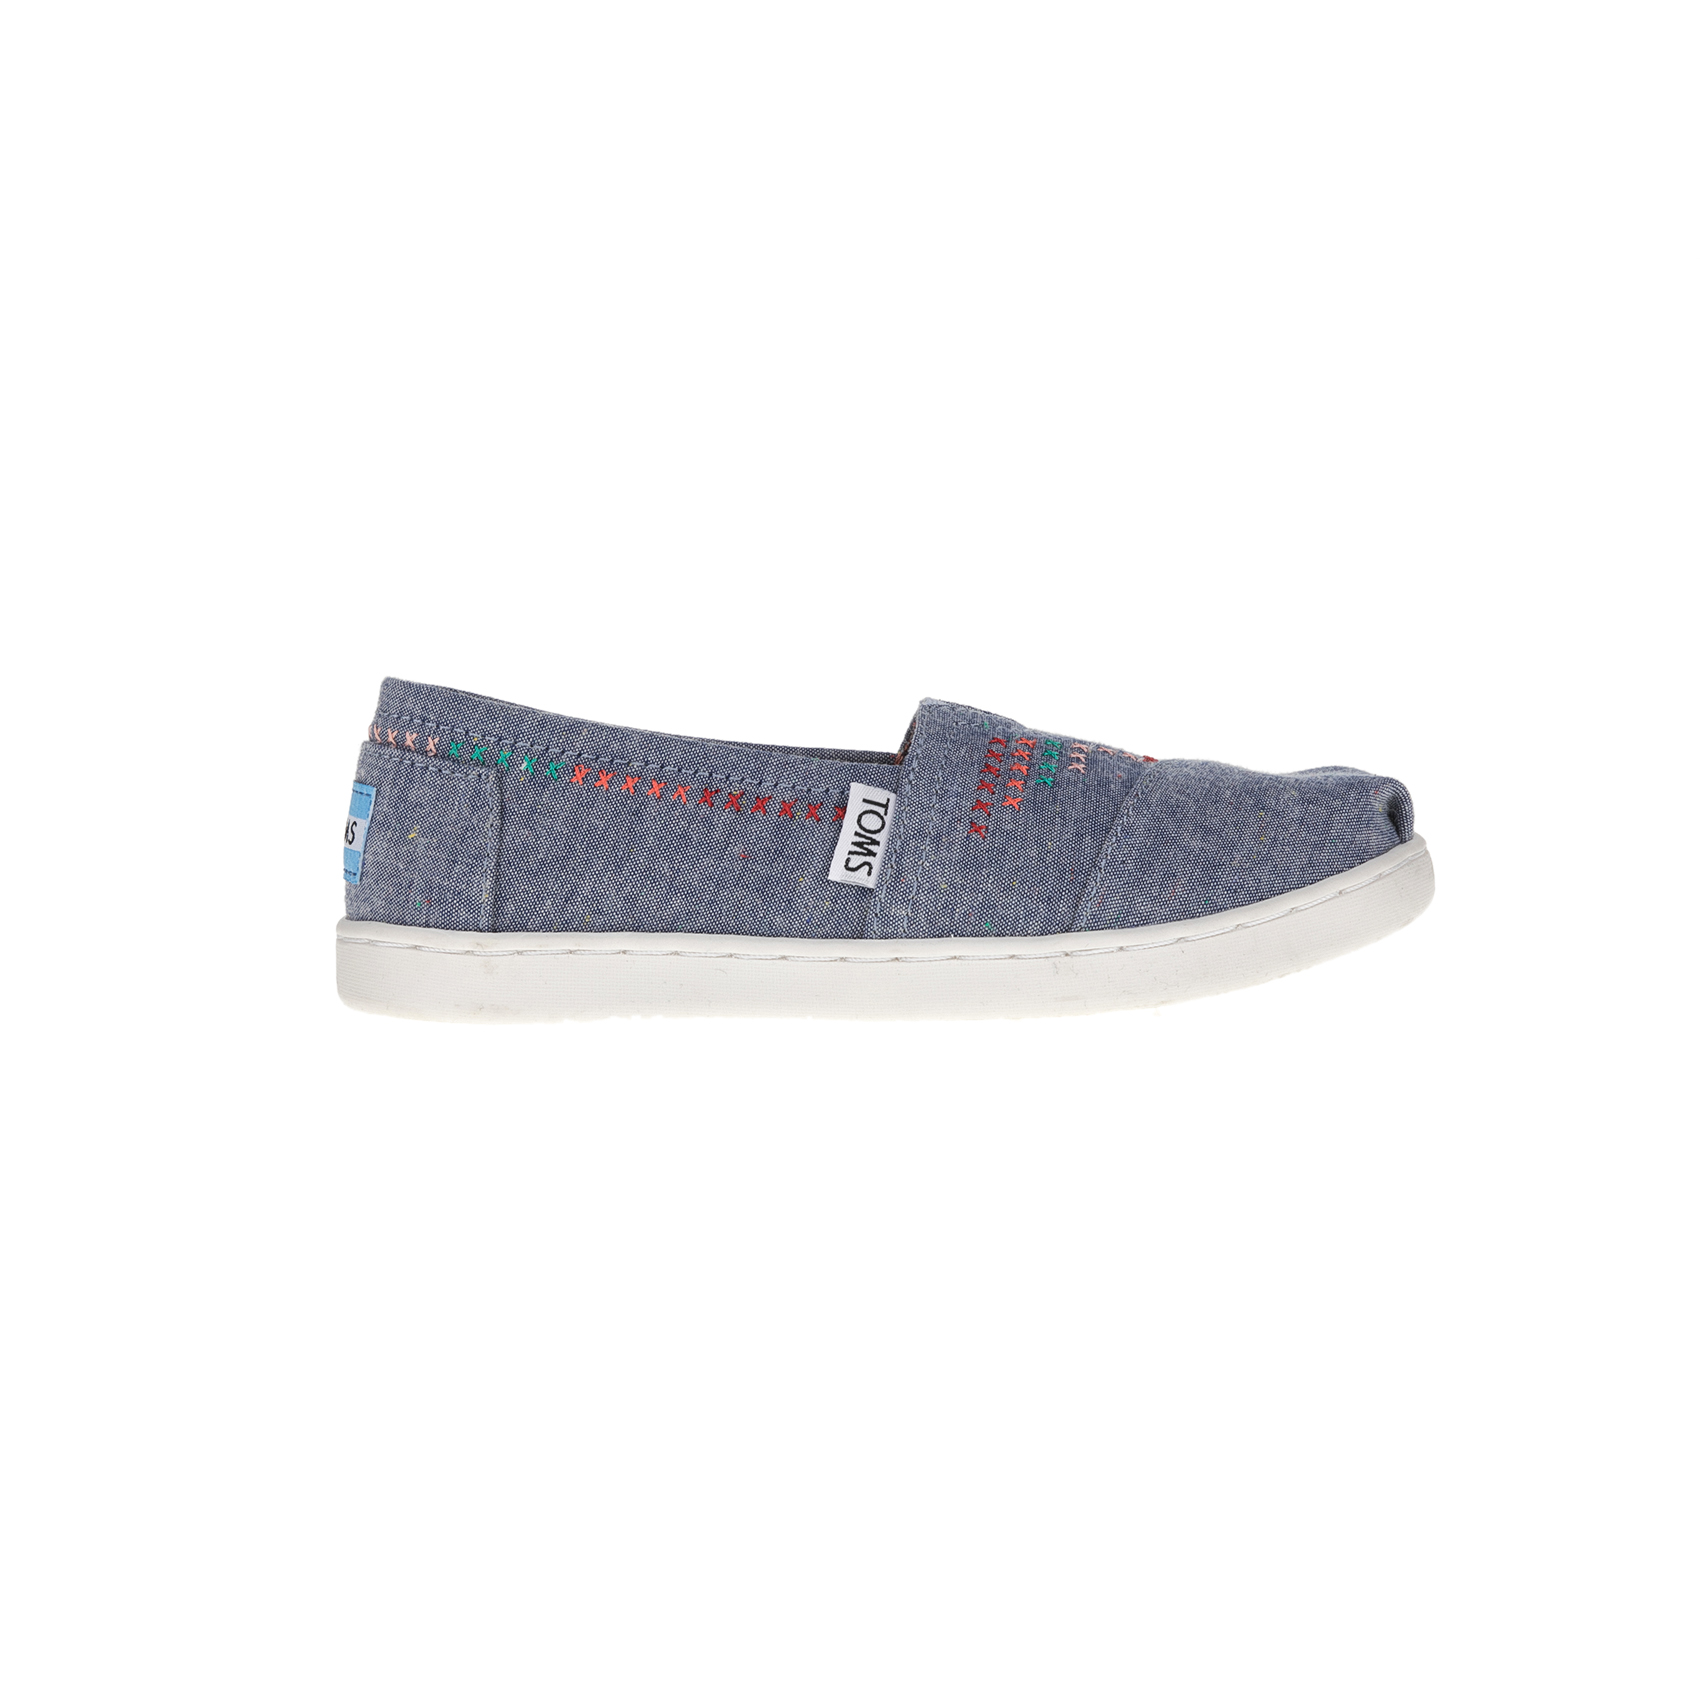 TOMS - Παιδικές εσπαντρίγιες TOMS SPKLE CHM YT ALPR ντένιμ παιδικά girls παπούτσια εσπαντρίγιες slip on